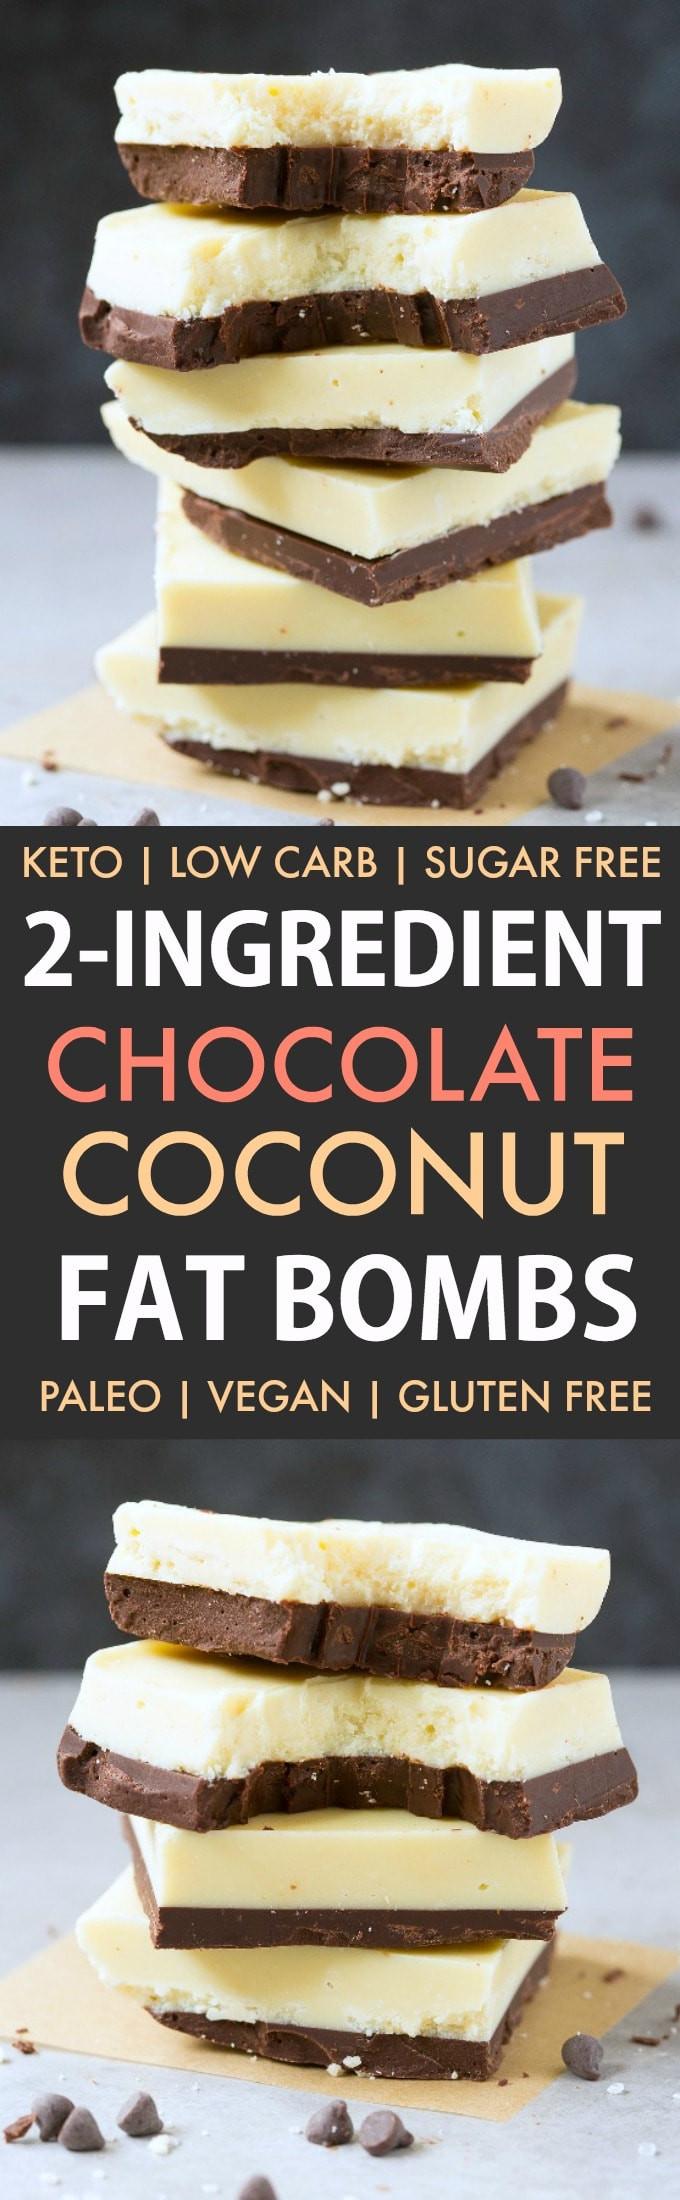 Low Fat Paleo Recipes  Low Carb Keto Chocolate Coconut Fat Bombs Paleo Vegan